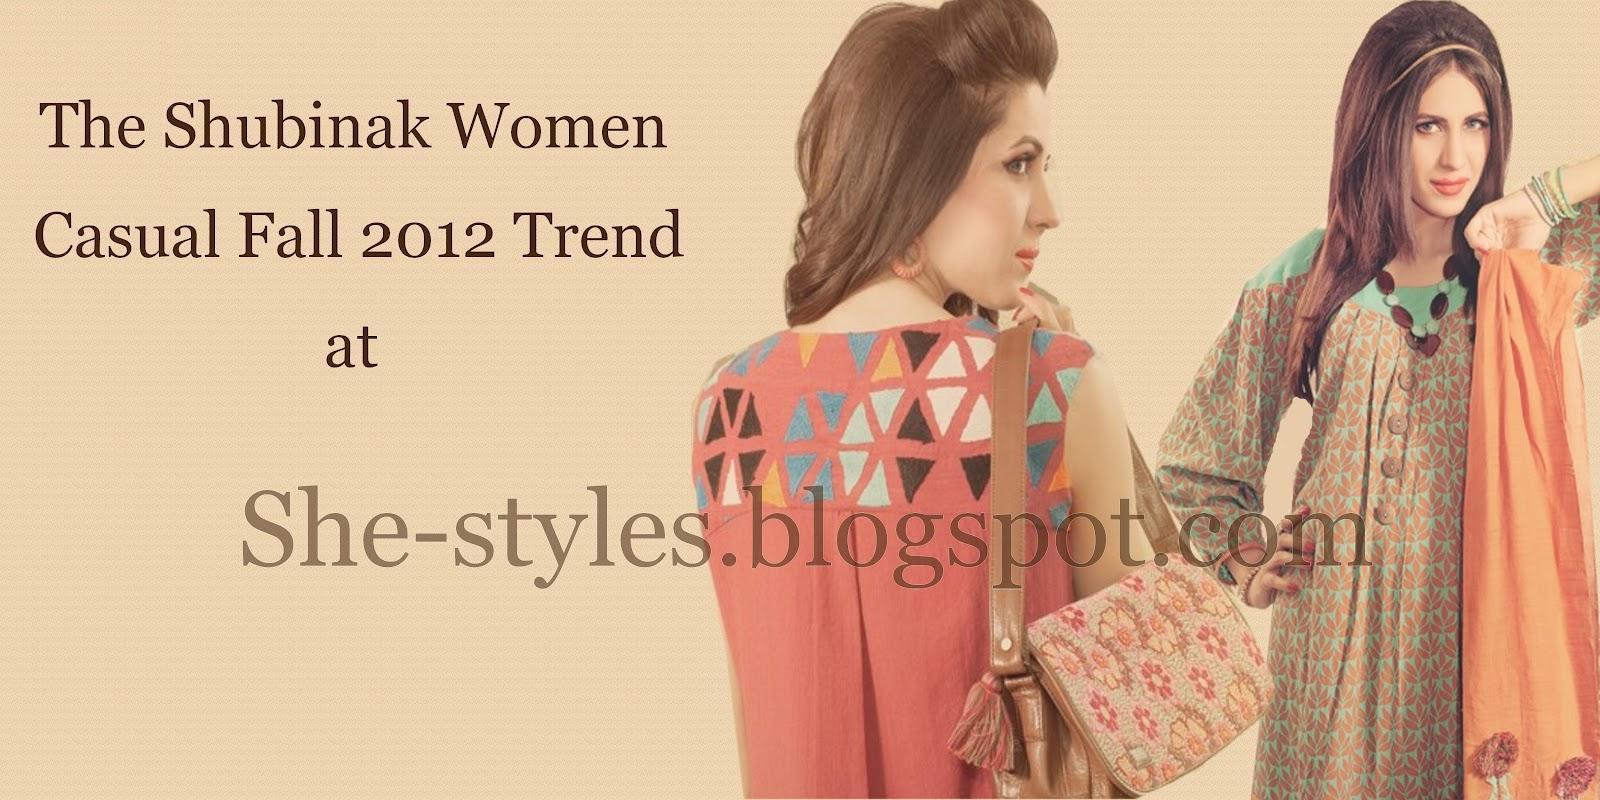 Shubinak Fall 2012 Casual Dresses For Ladies Yoga Jasmine Camelia 03